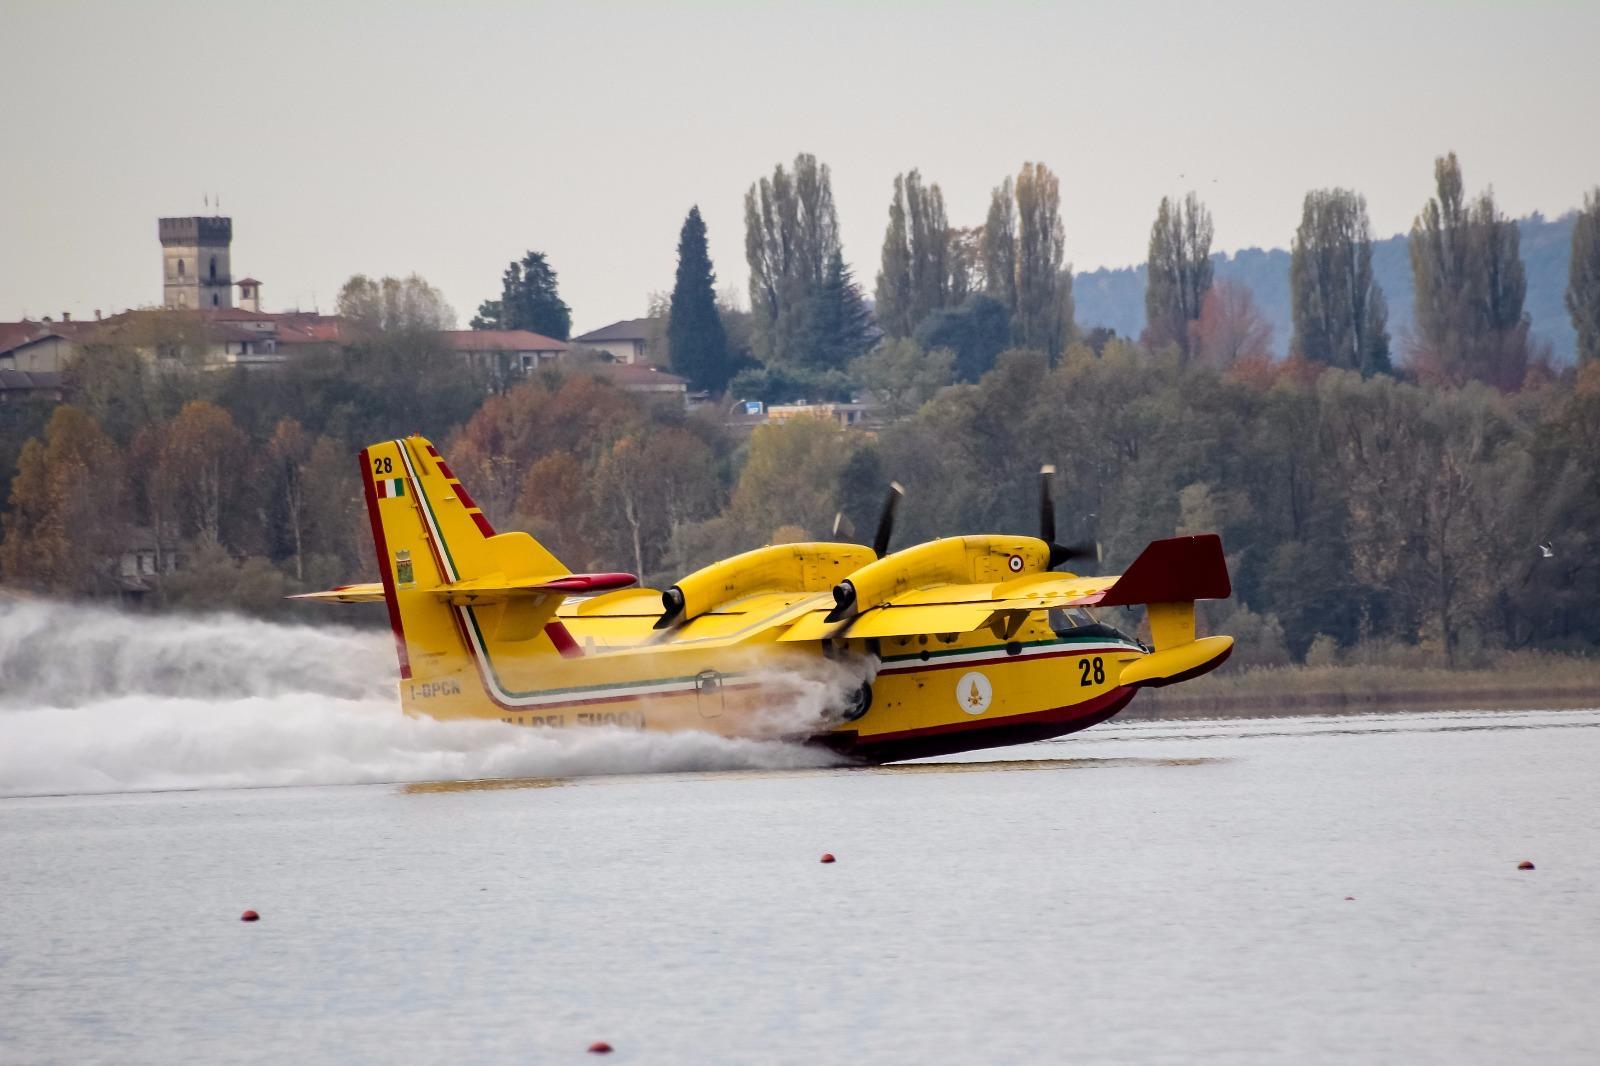 Incendi anche in Lombardia, canadair in azione a Varese